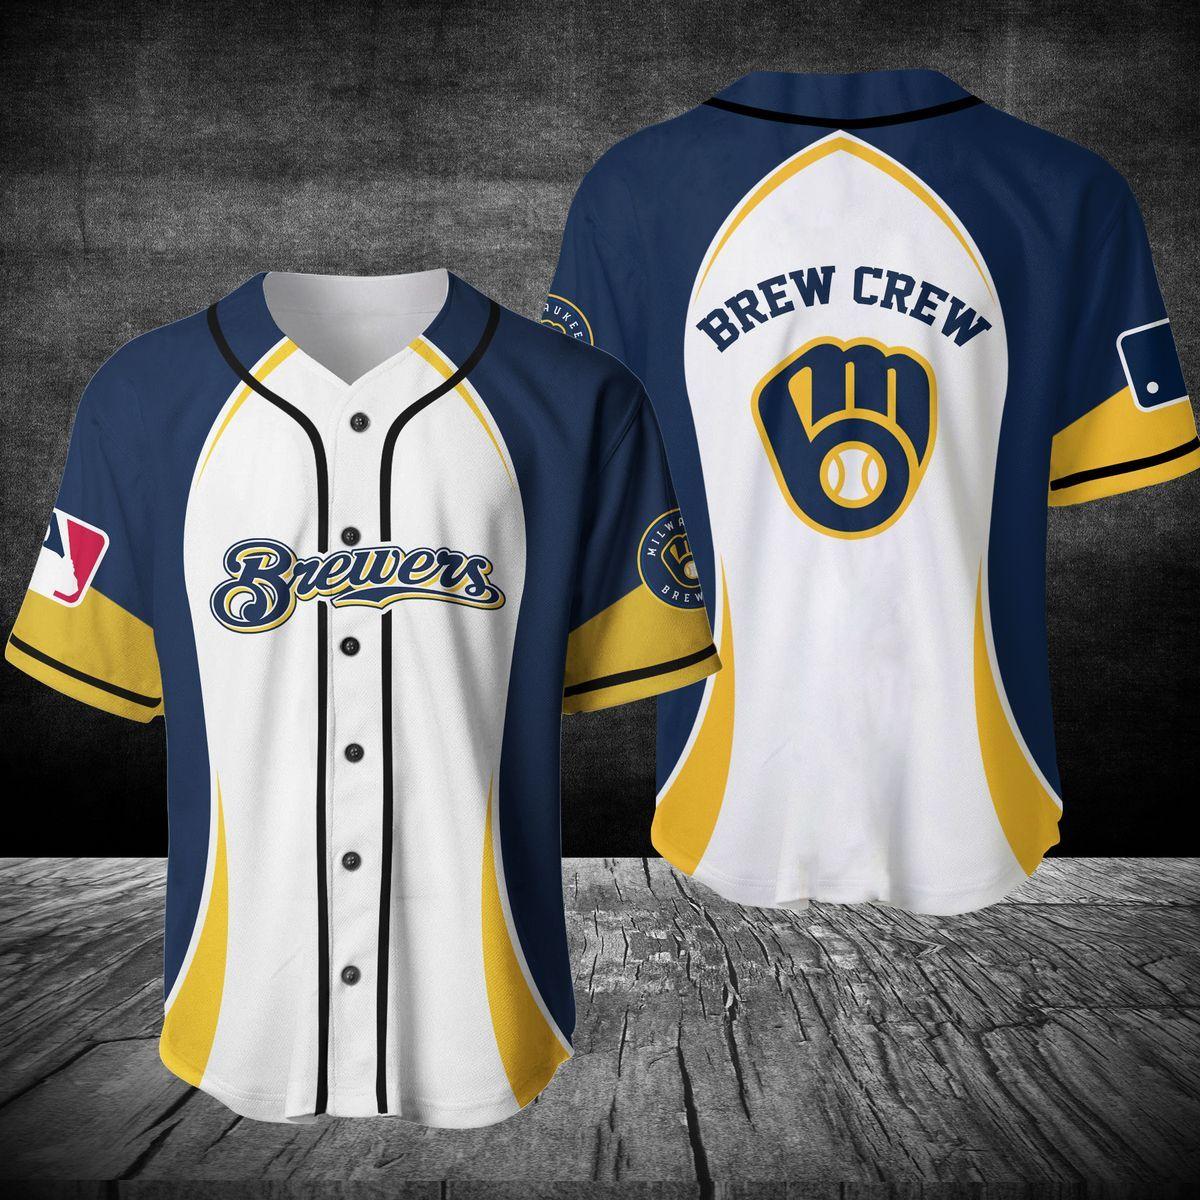 Milwaukee Brewers brew crew baseball jersey shirt